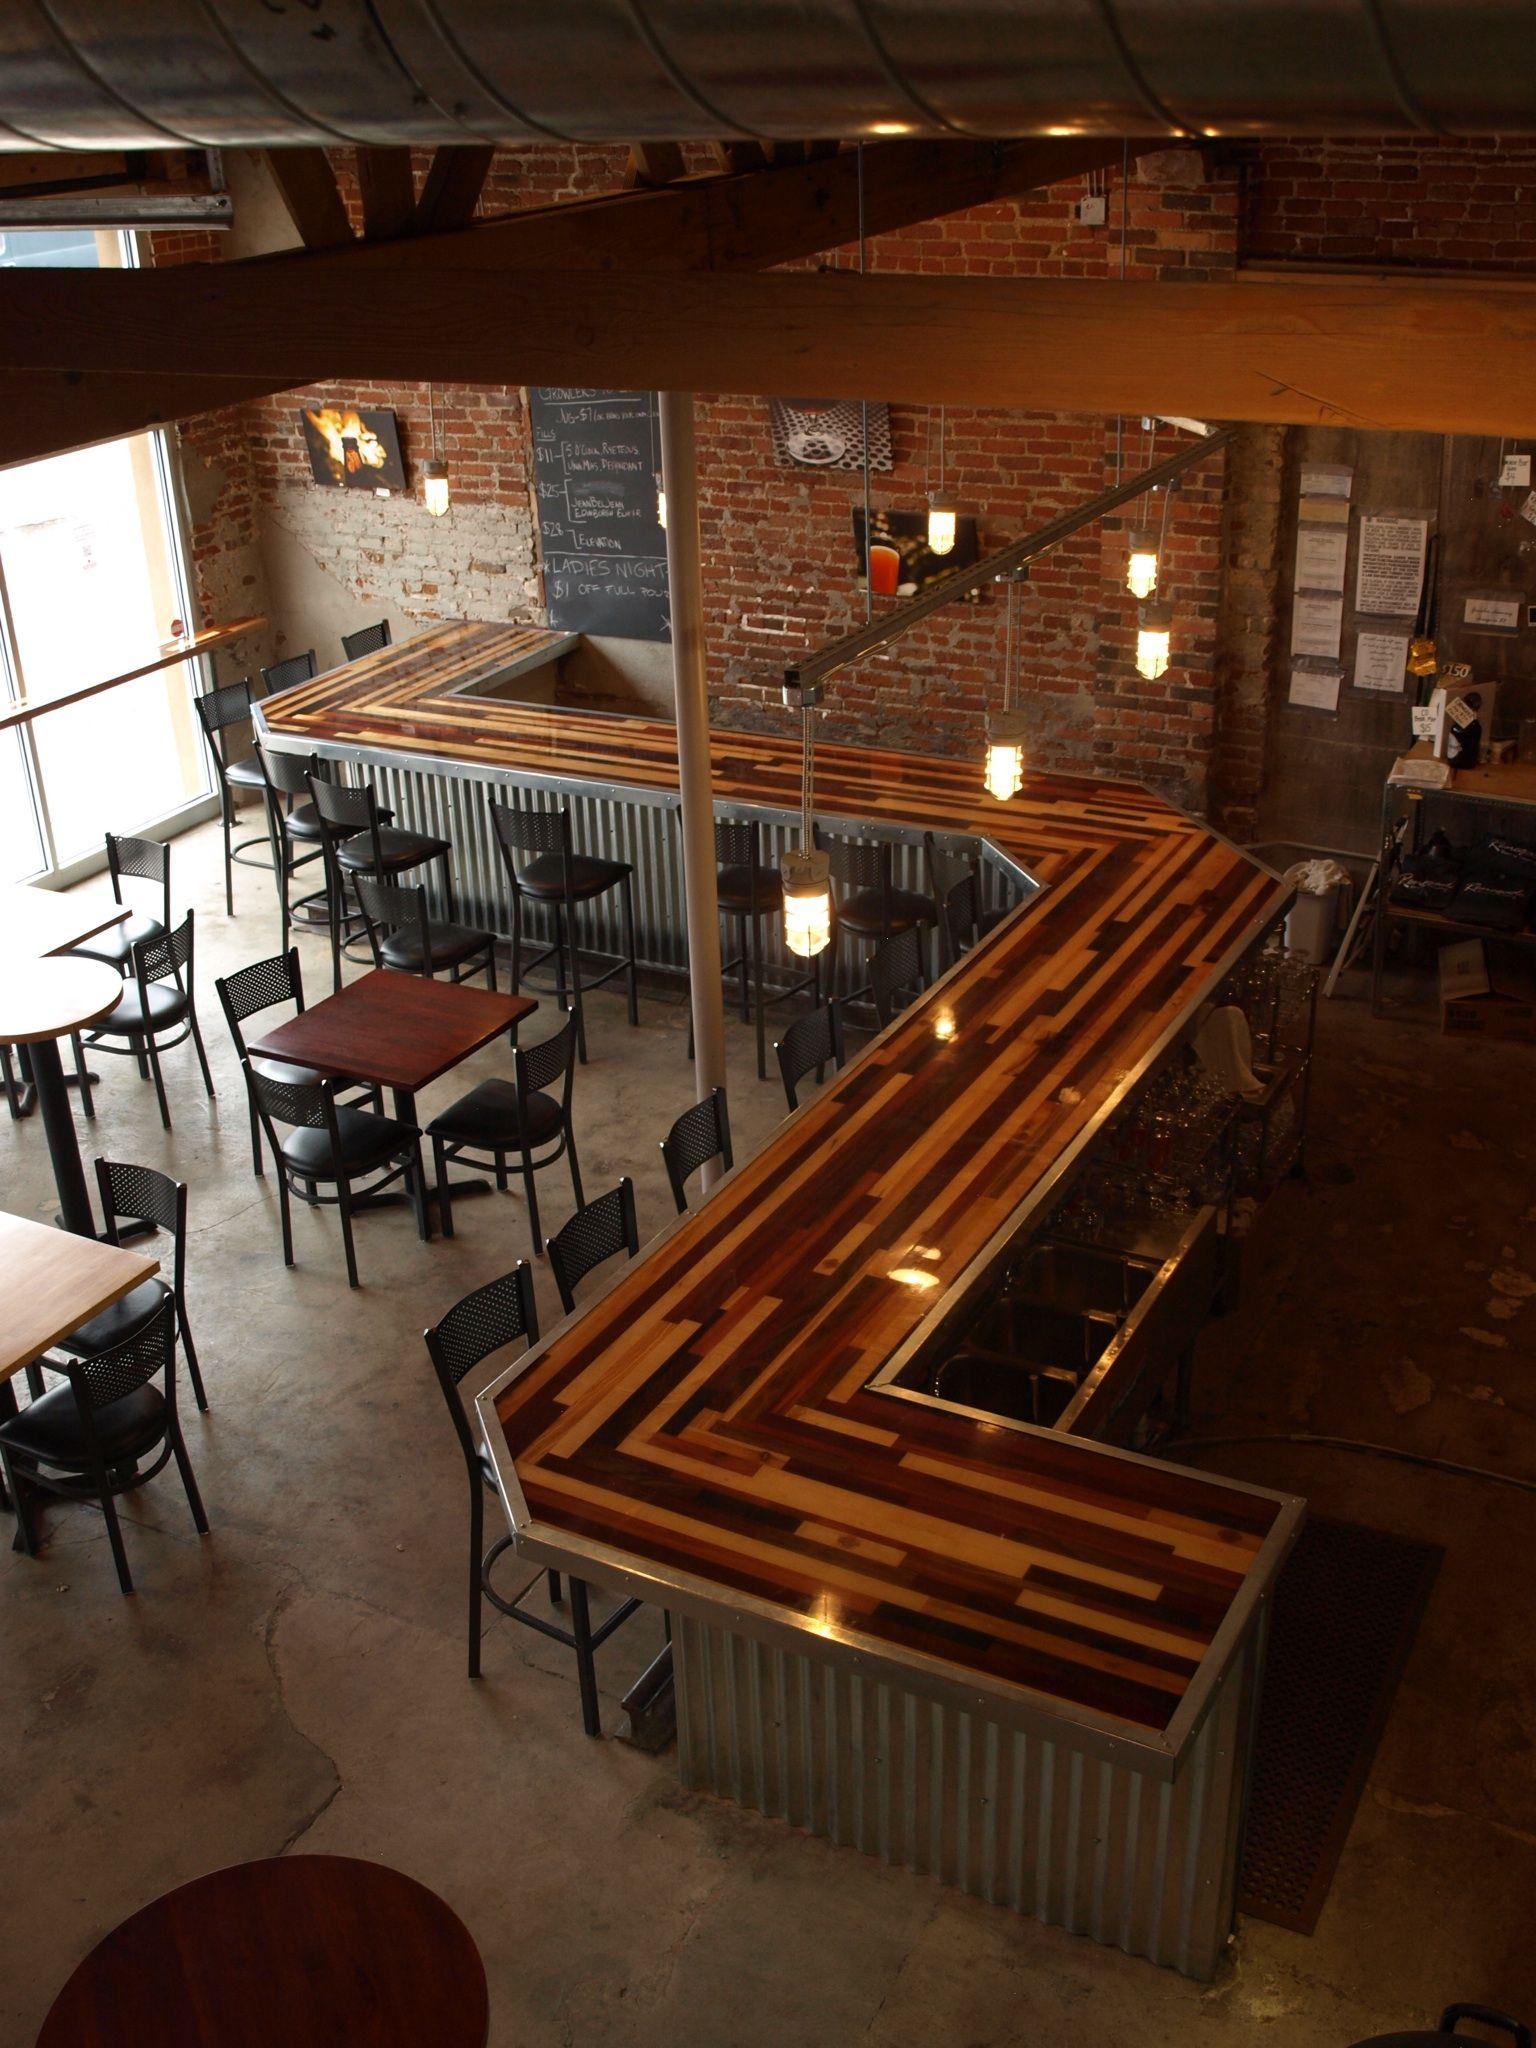 Renegade brewery bar top by Esinem Designs | bar tops | Pinterest ...